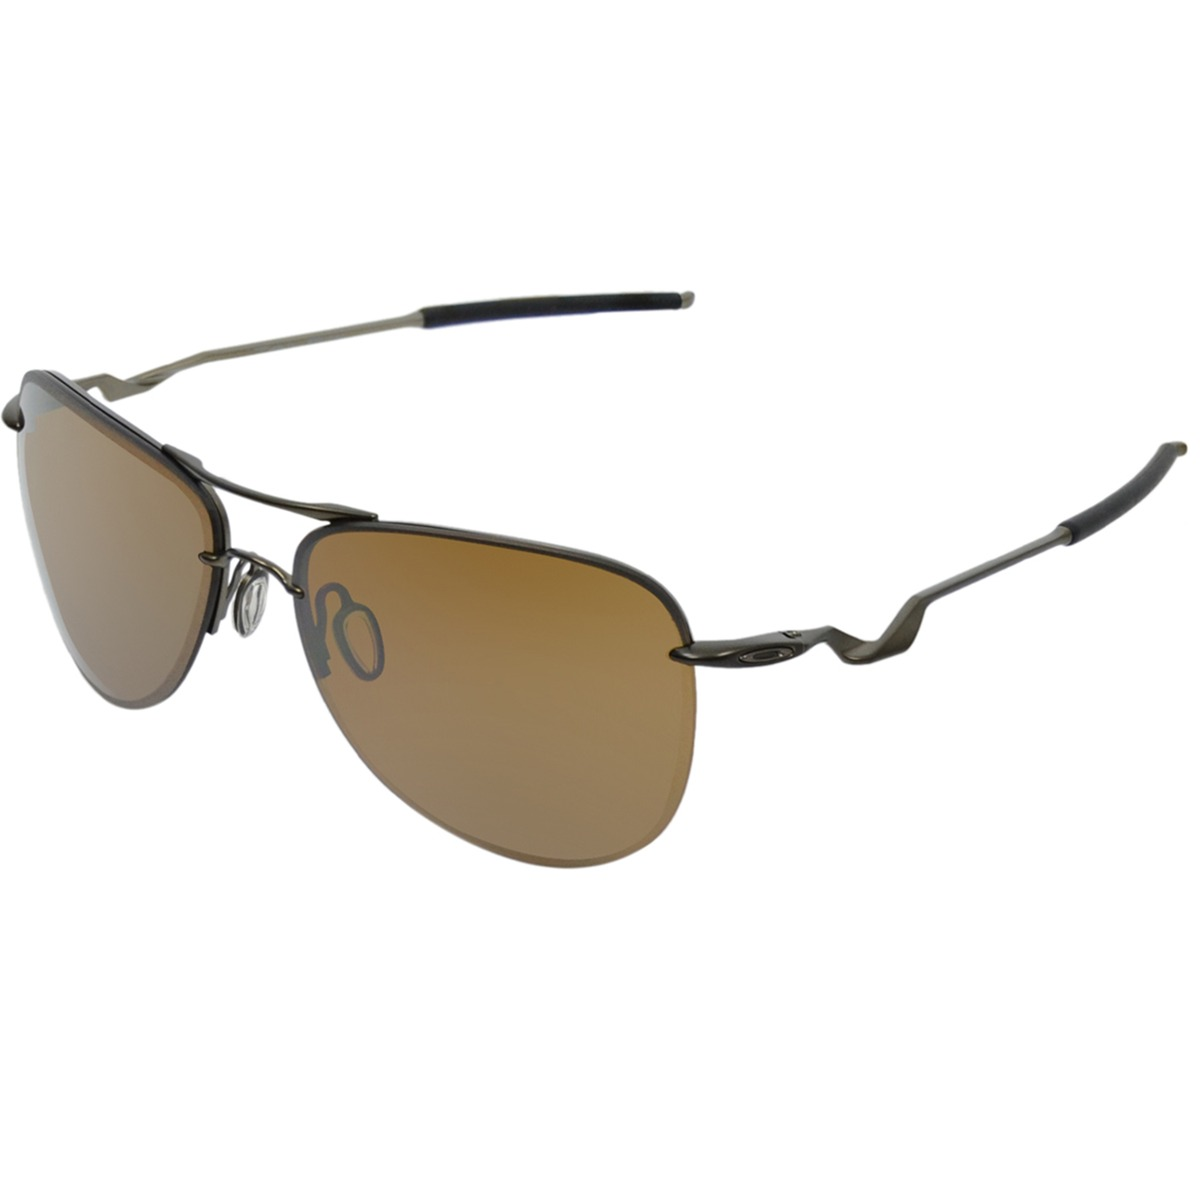 Óculos Oakley Tailpin - R  499,90 em Mercado Livre 6ba48c73bc